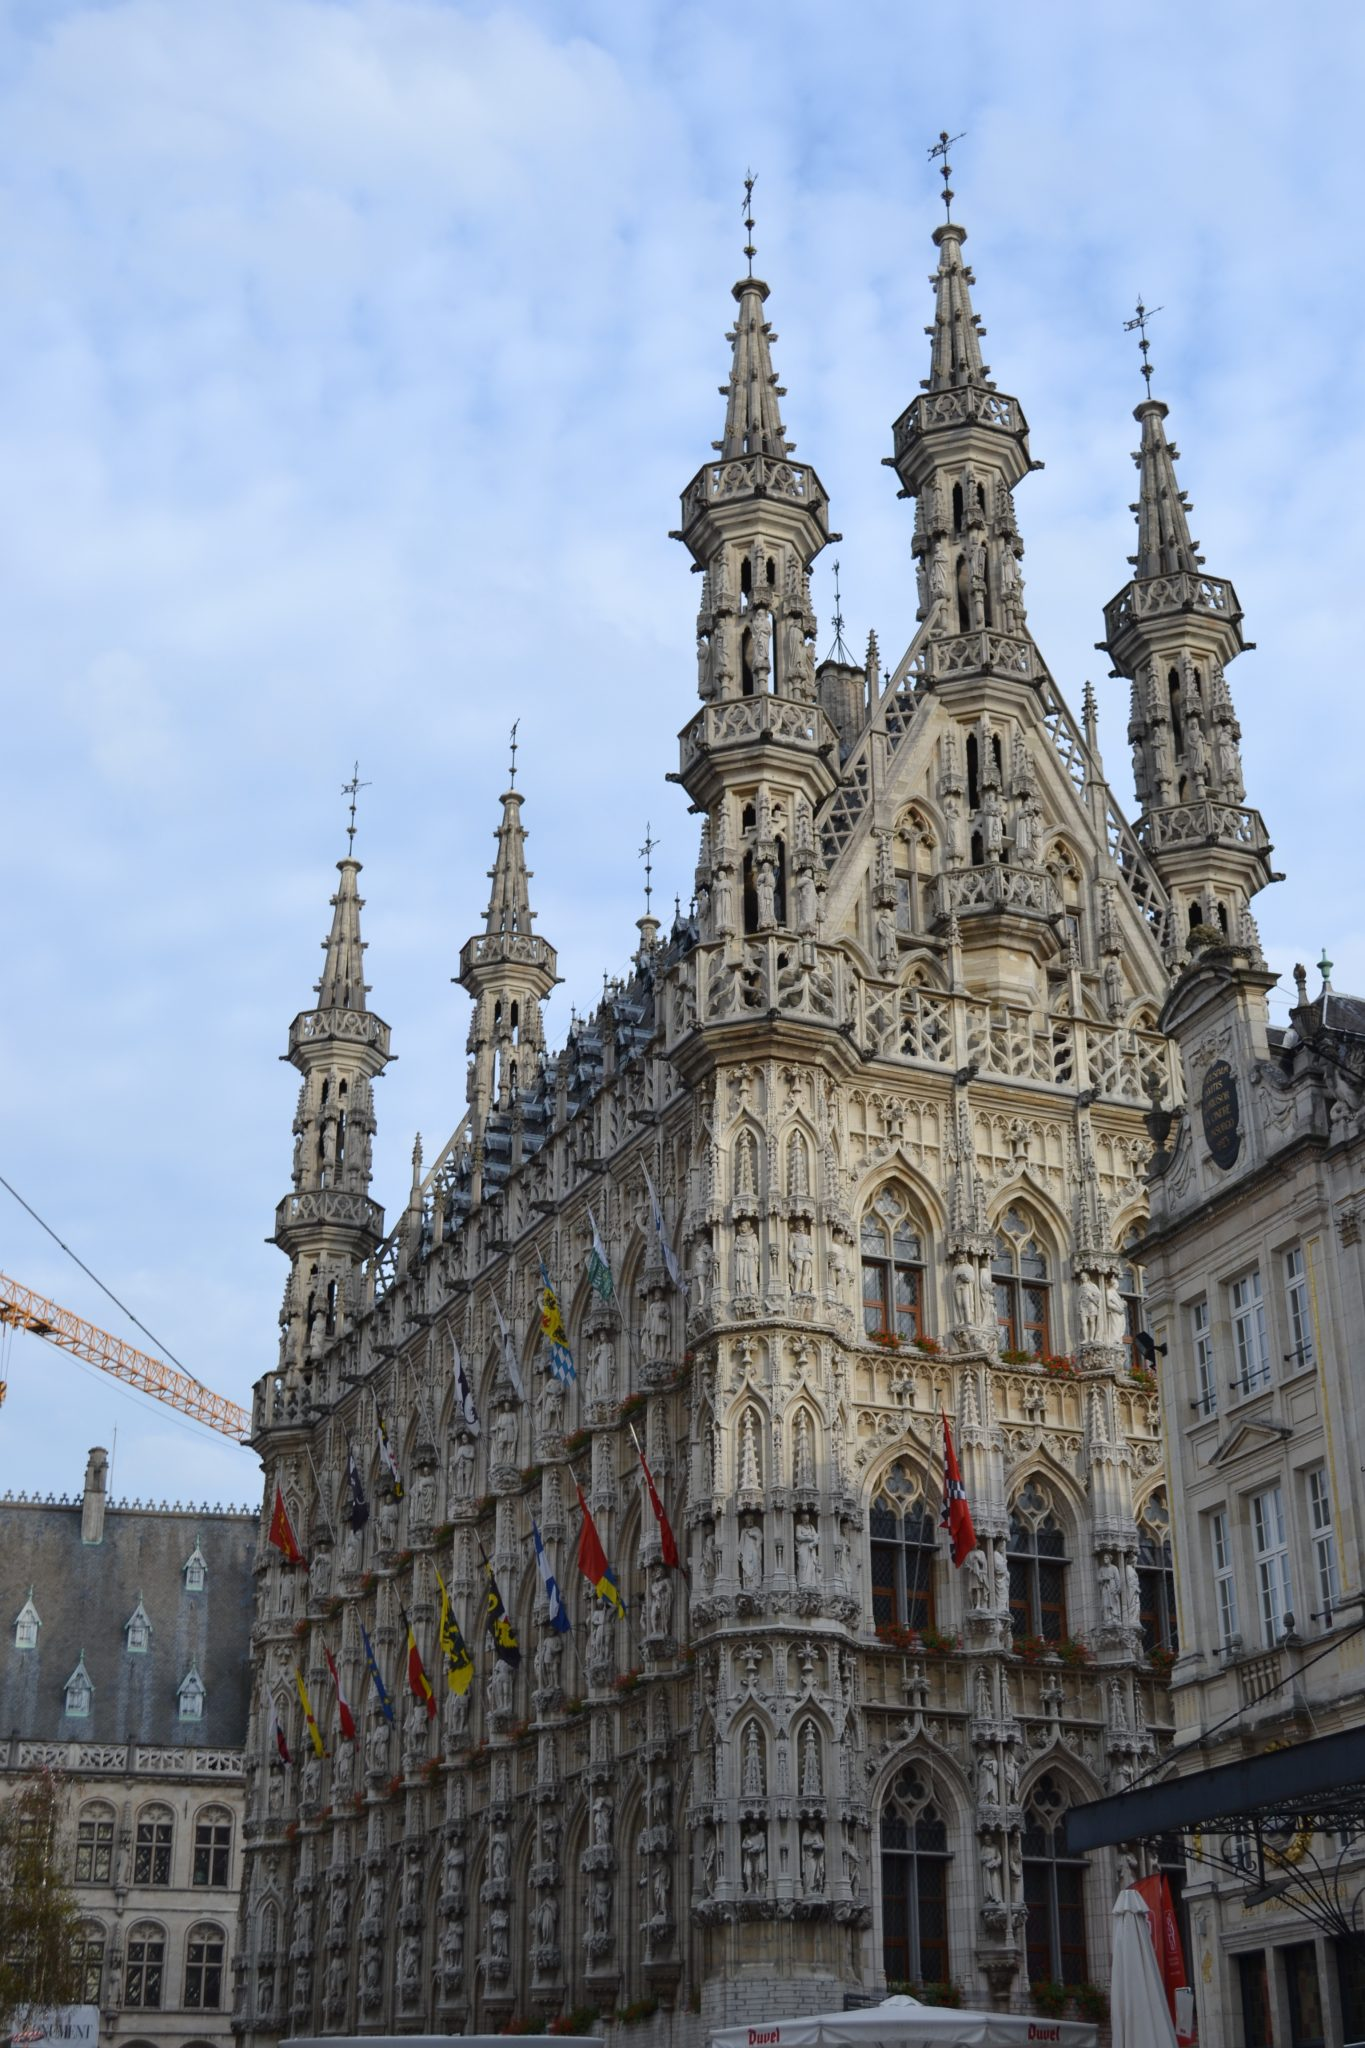 Travel Diary: Leuven | Belgium - dsc 0143